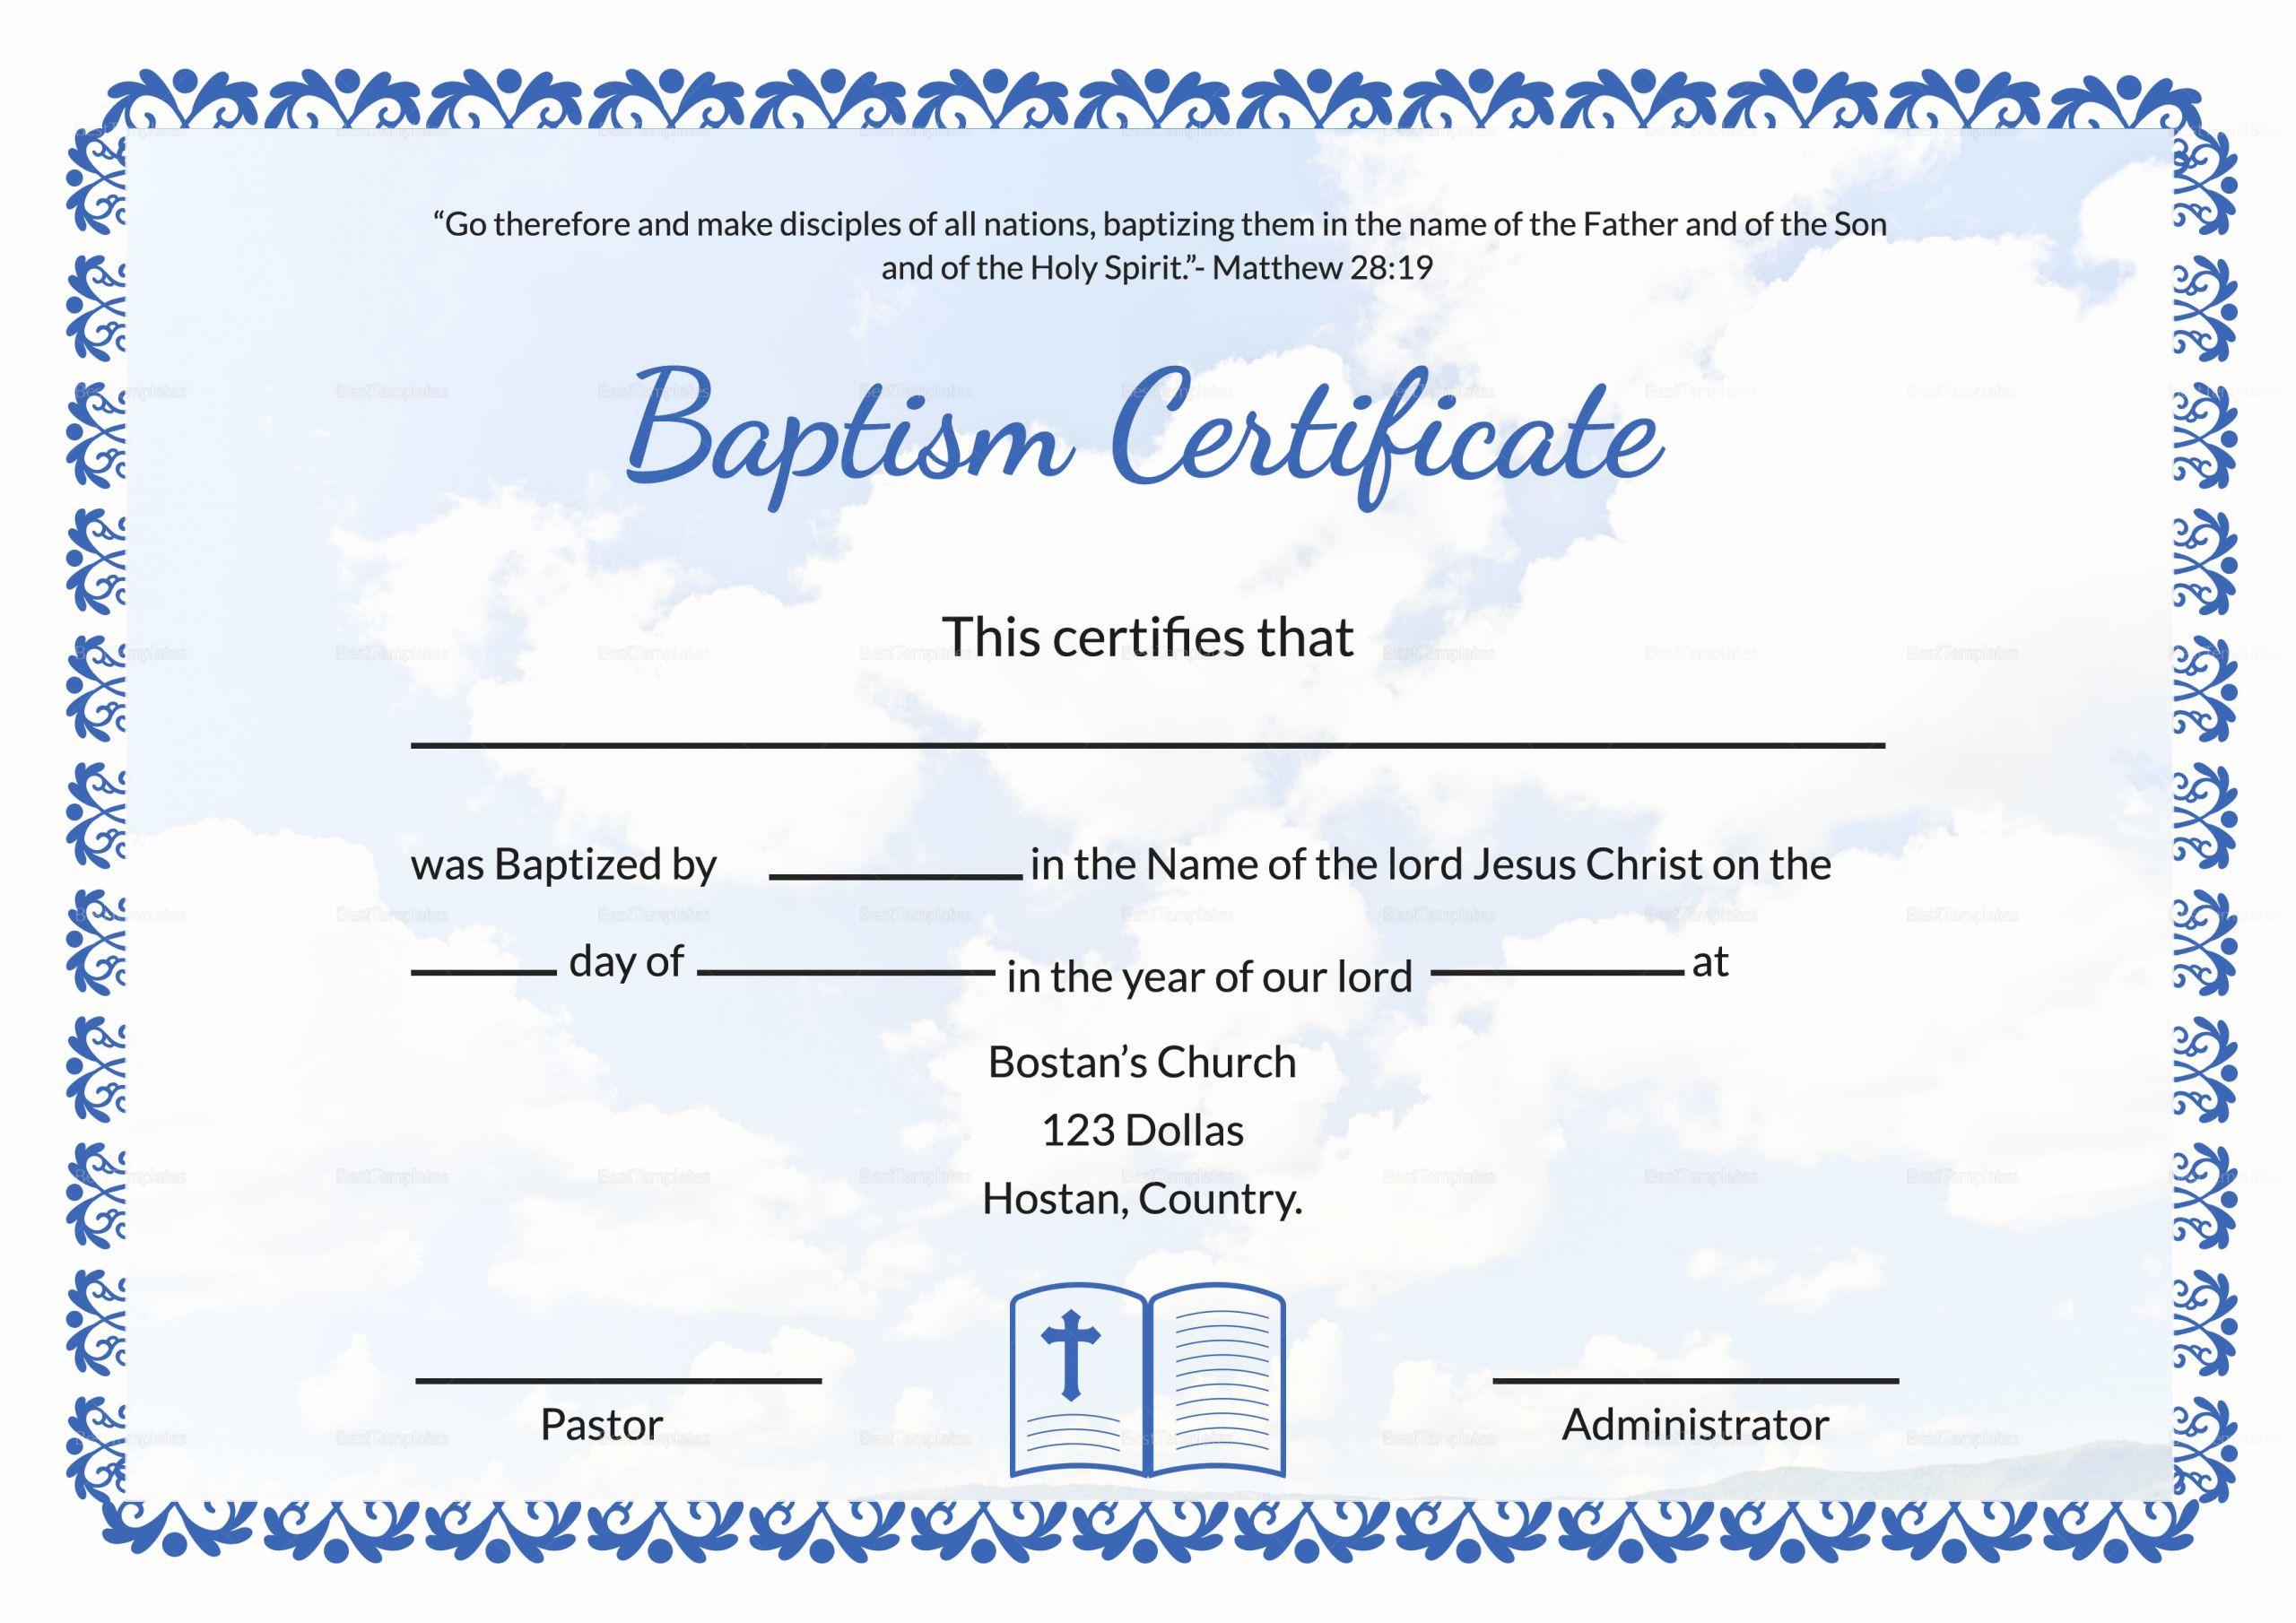 Microsoft Word Baptism Certificate Template Awesome Editable Baptism Certificate Template In Adobe Shop